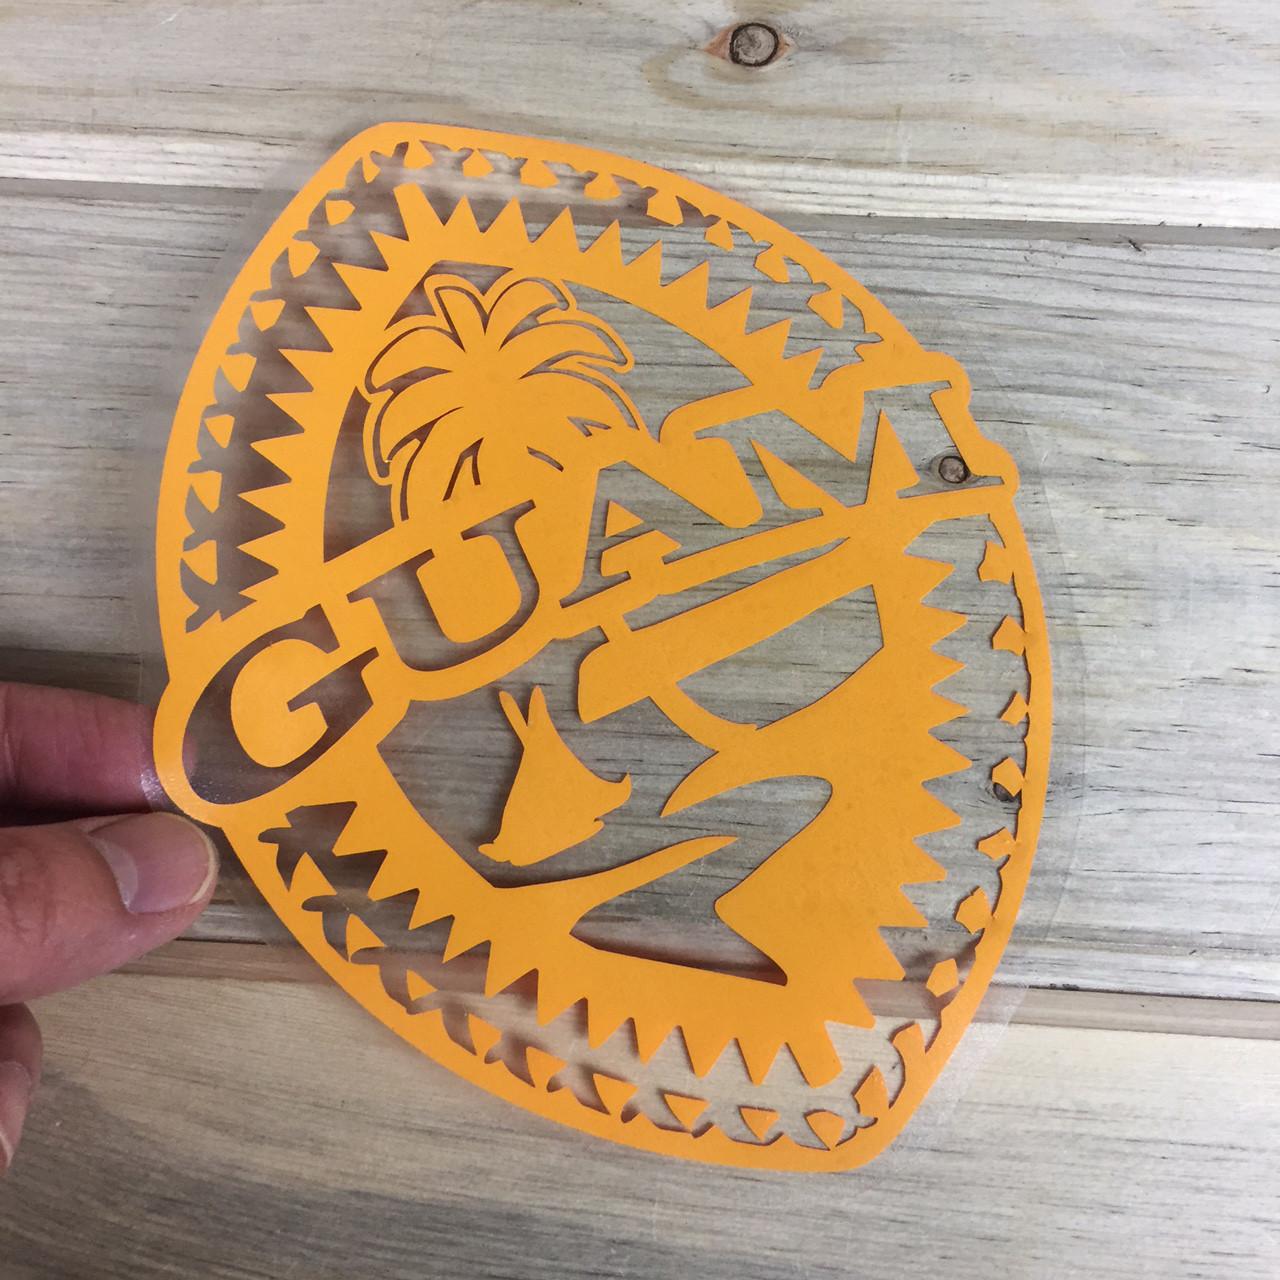 Tribal Guam Seal Yellow Vinyl Decal 6x8